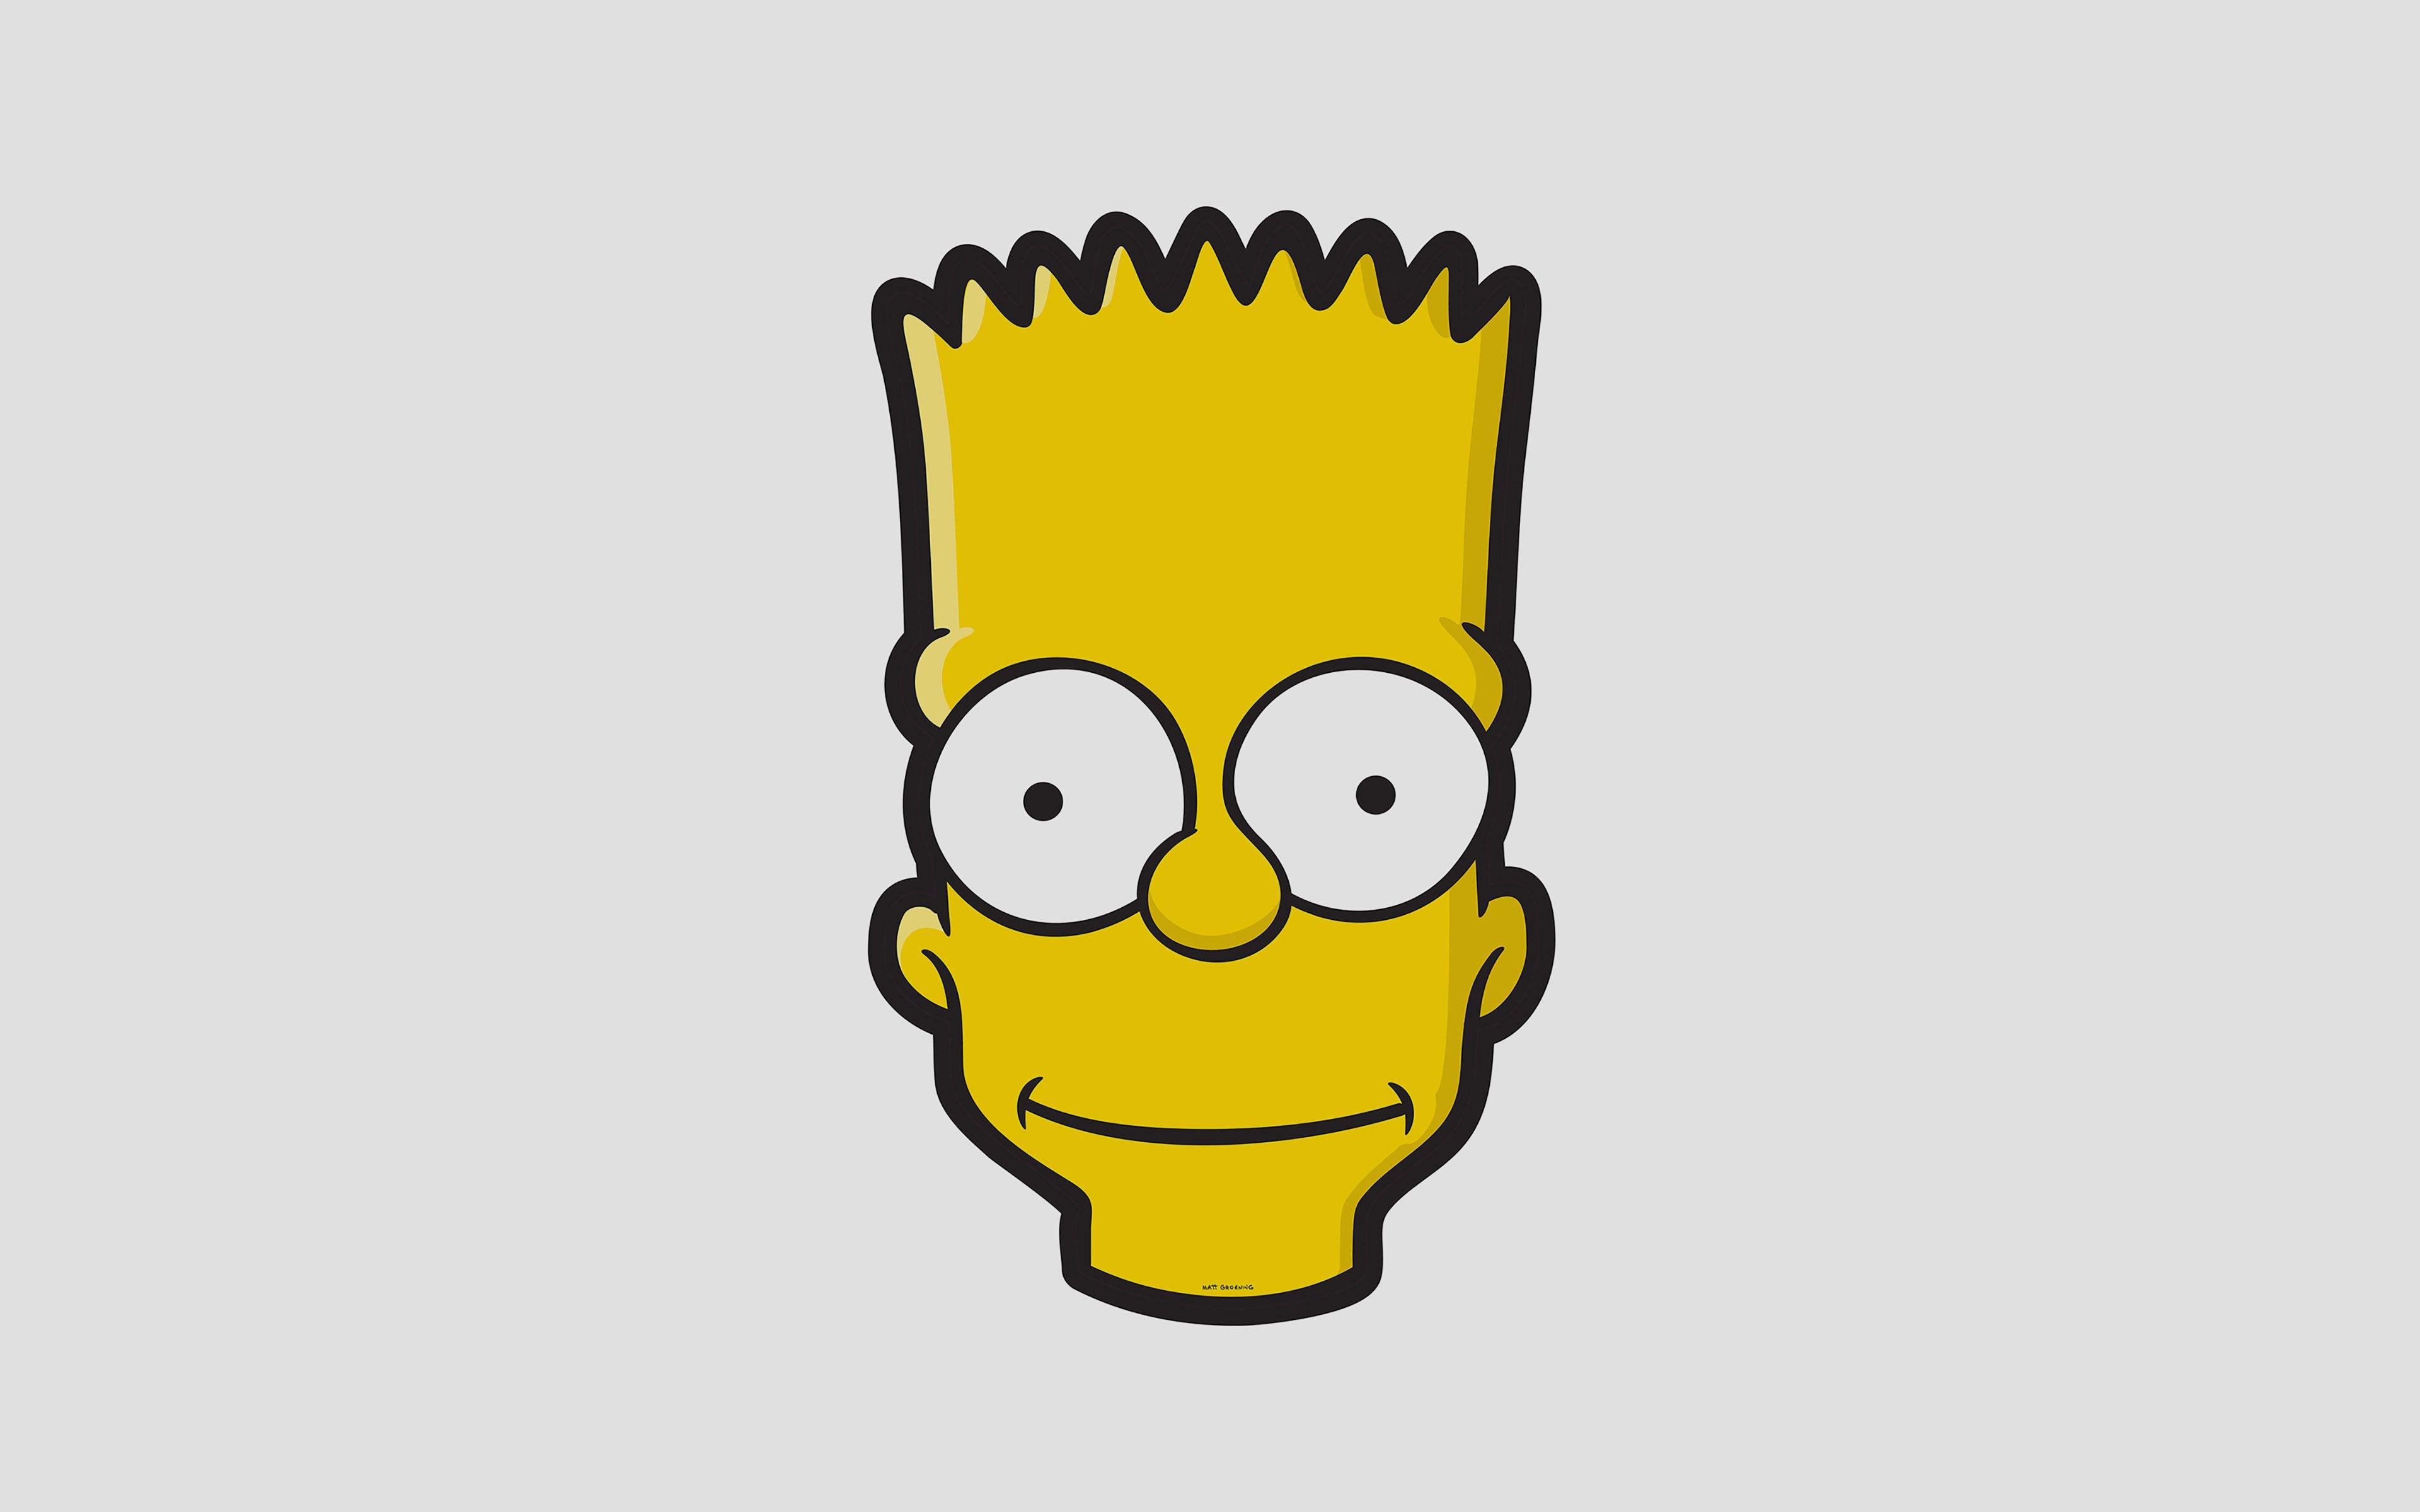 Fondos de pantalla Bart Simpson Minimalista